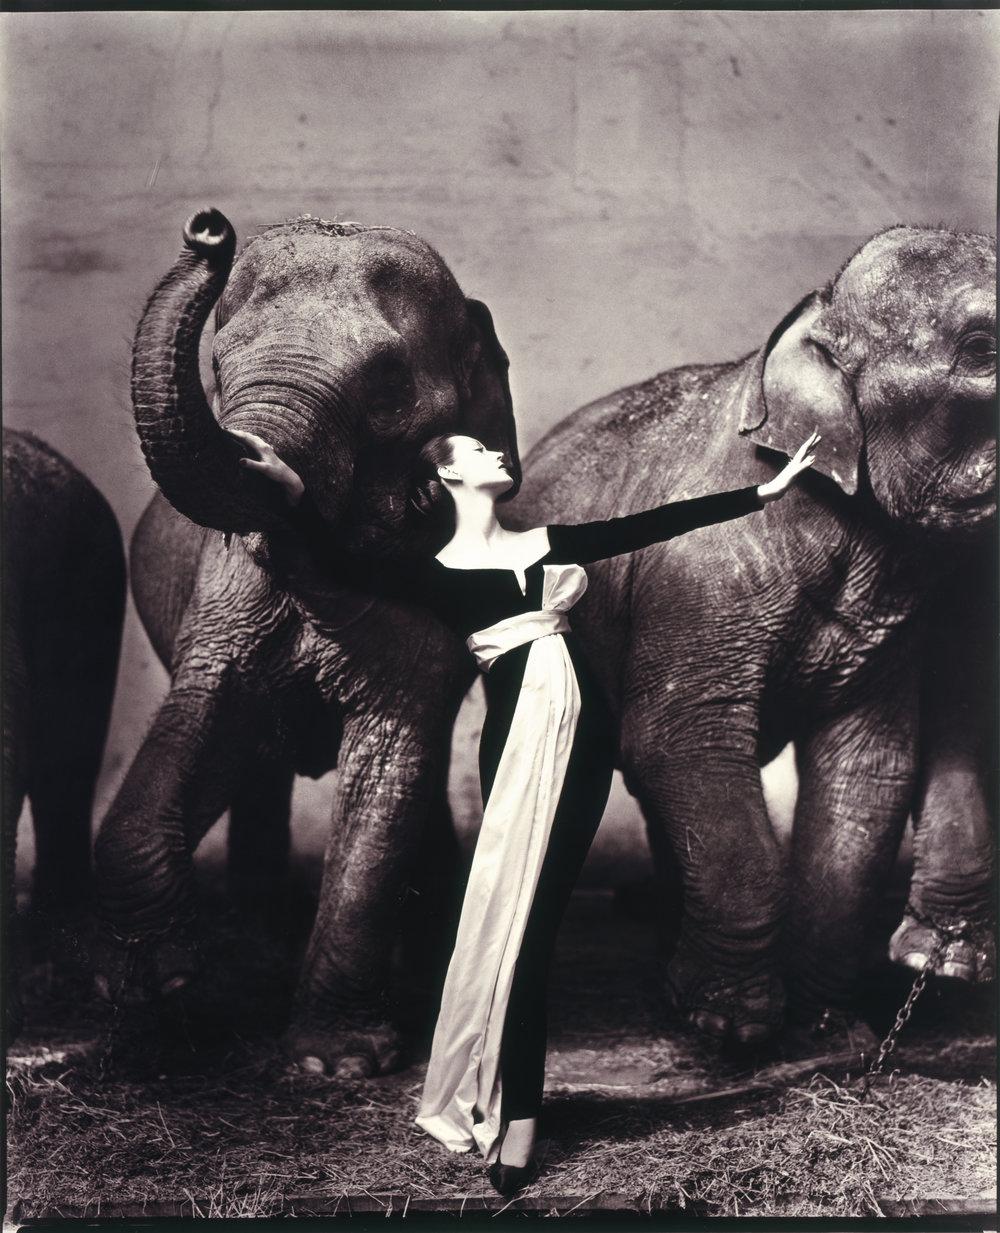 Dovima with Elephants, Evening Dress by Dior, Cirque d'Hiver, Paris, August 1955